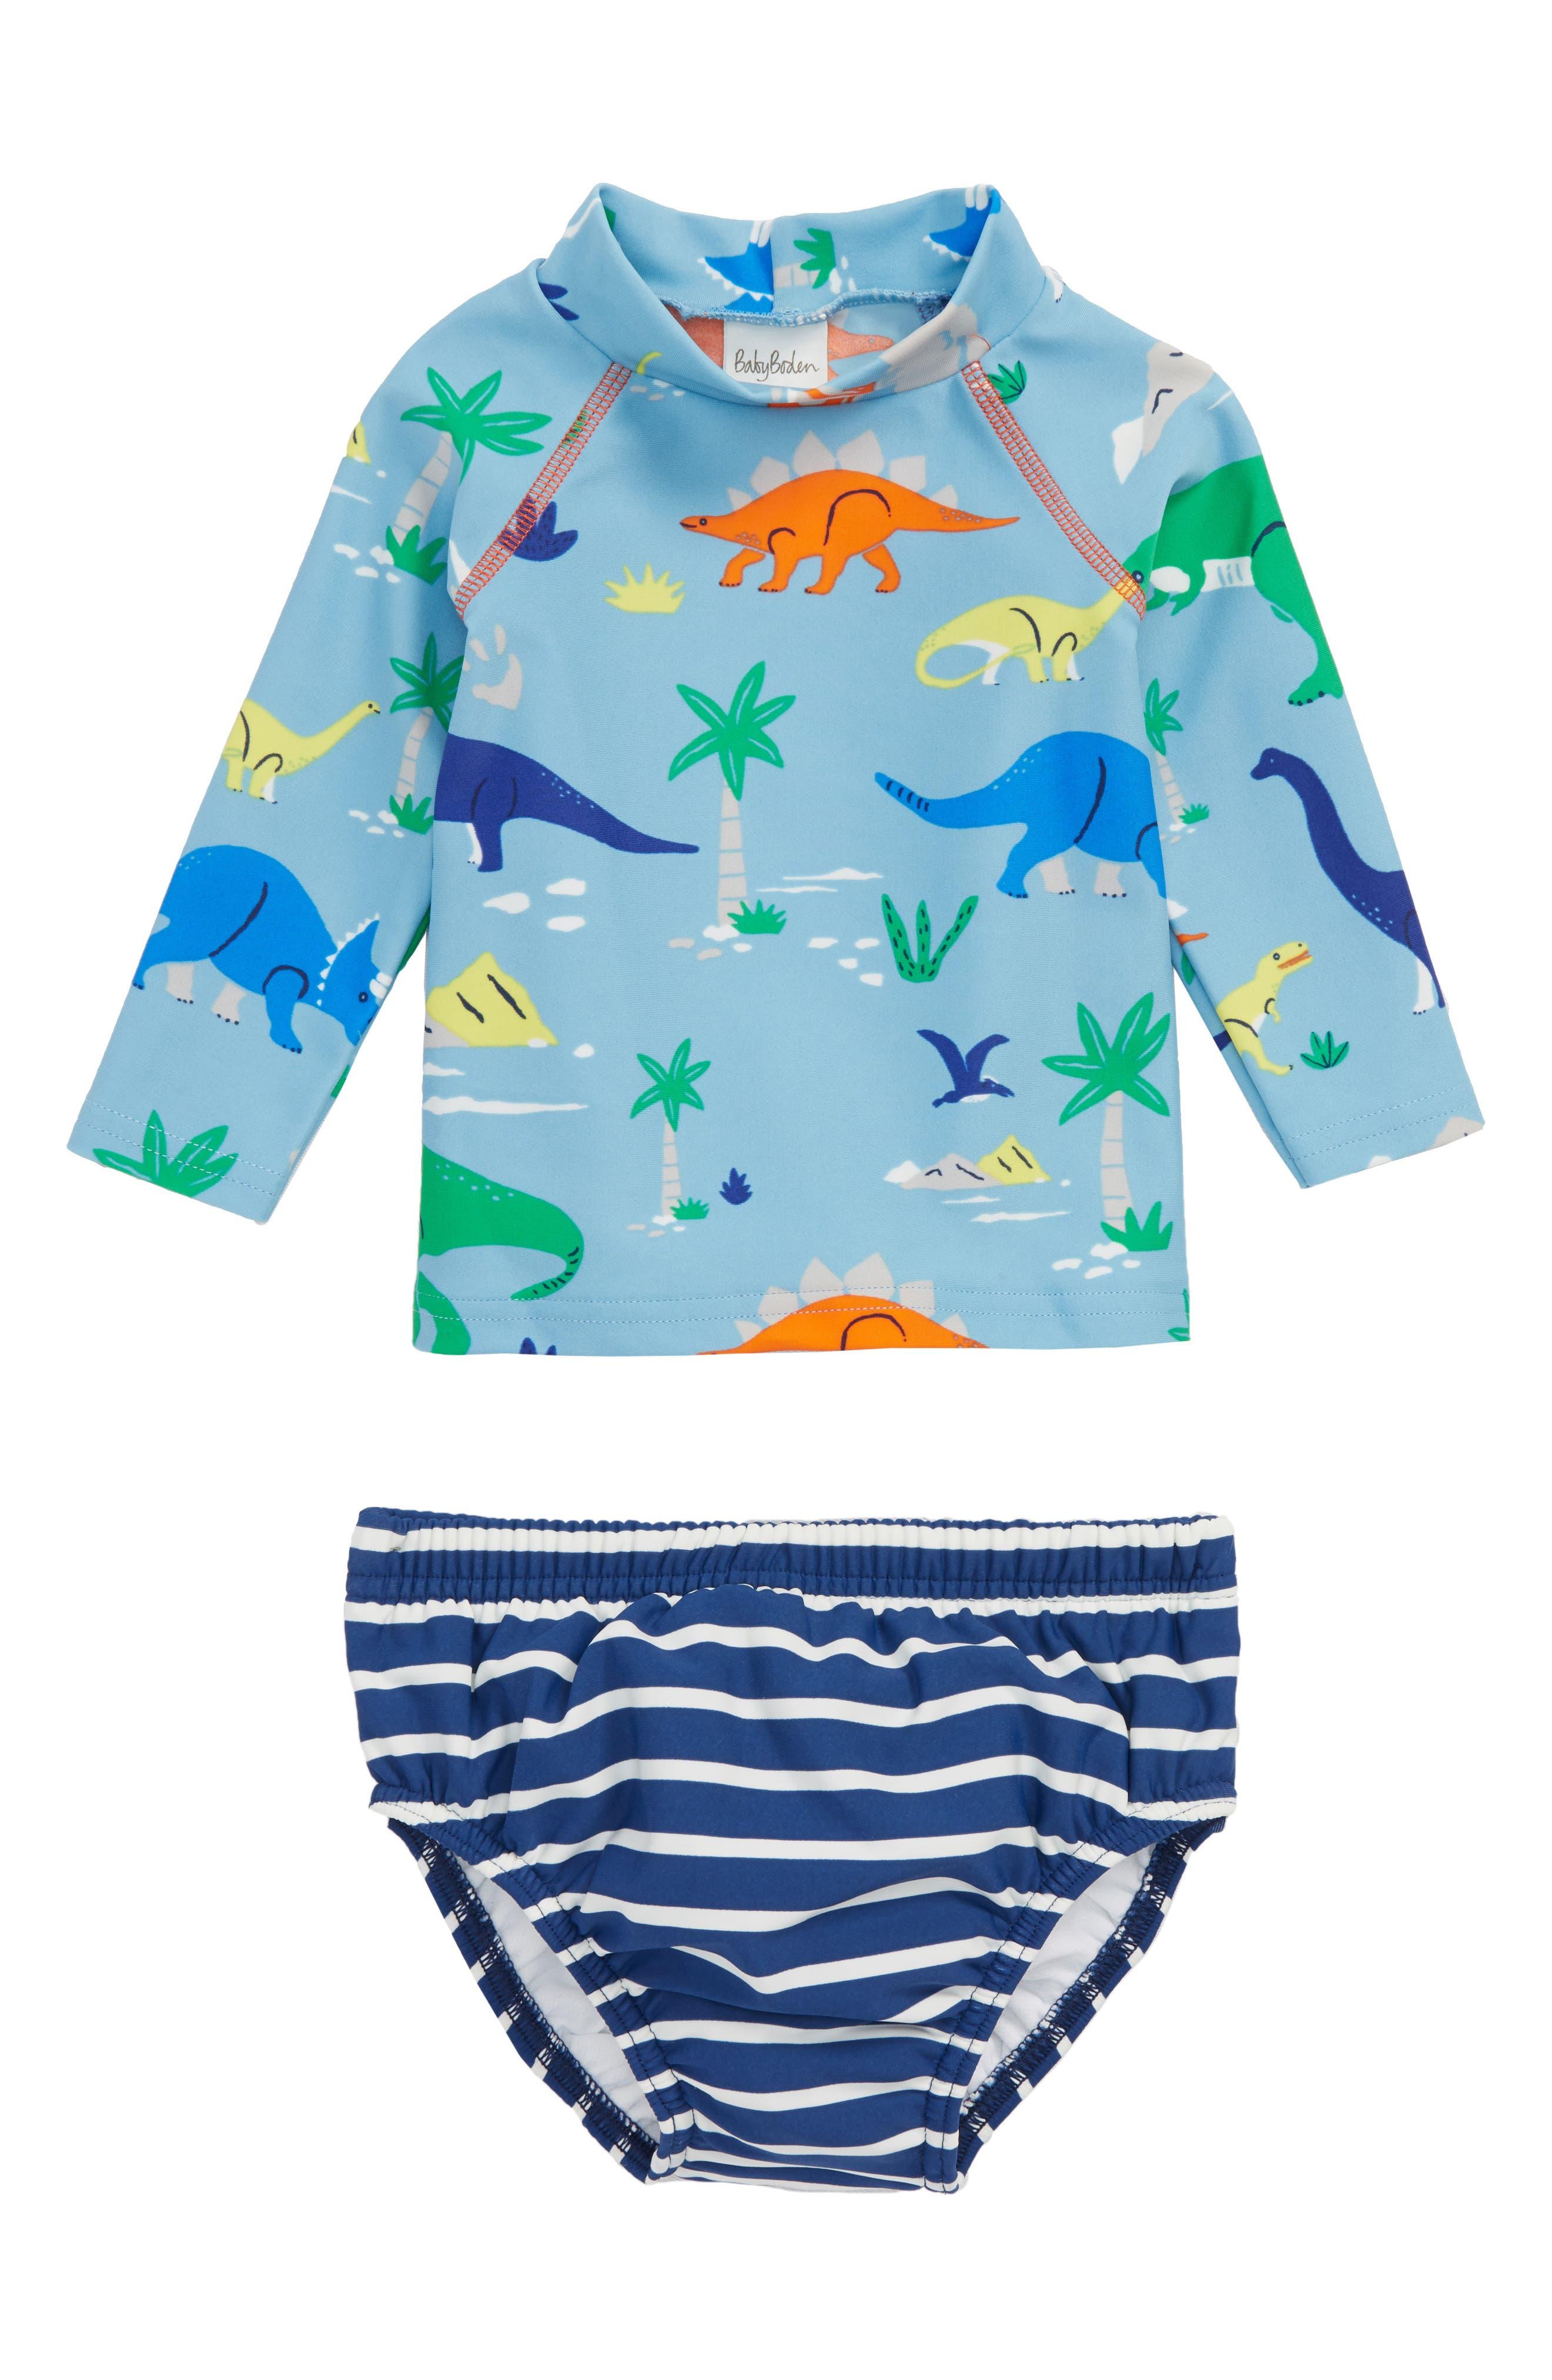 Two-Piece Rashguard Swimsuit,                             Main thumbnail 1, color,                             486